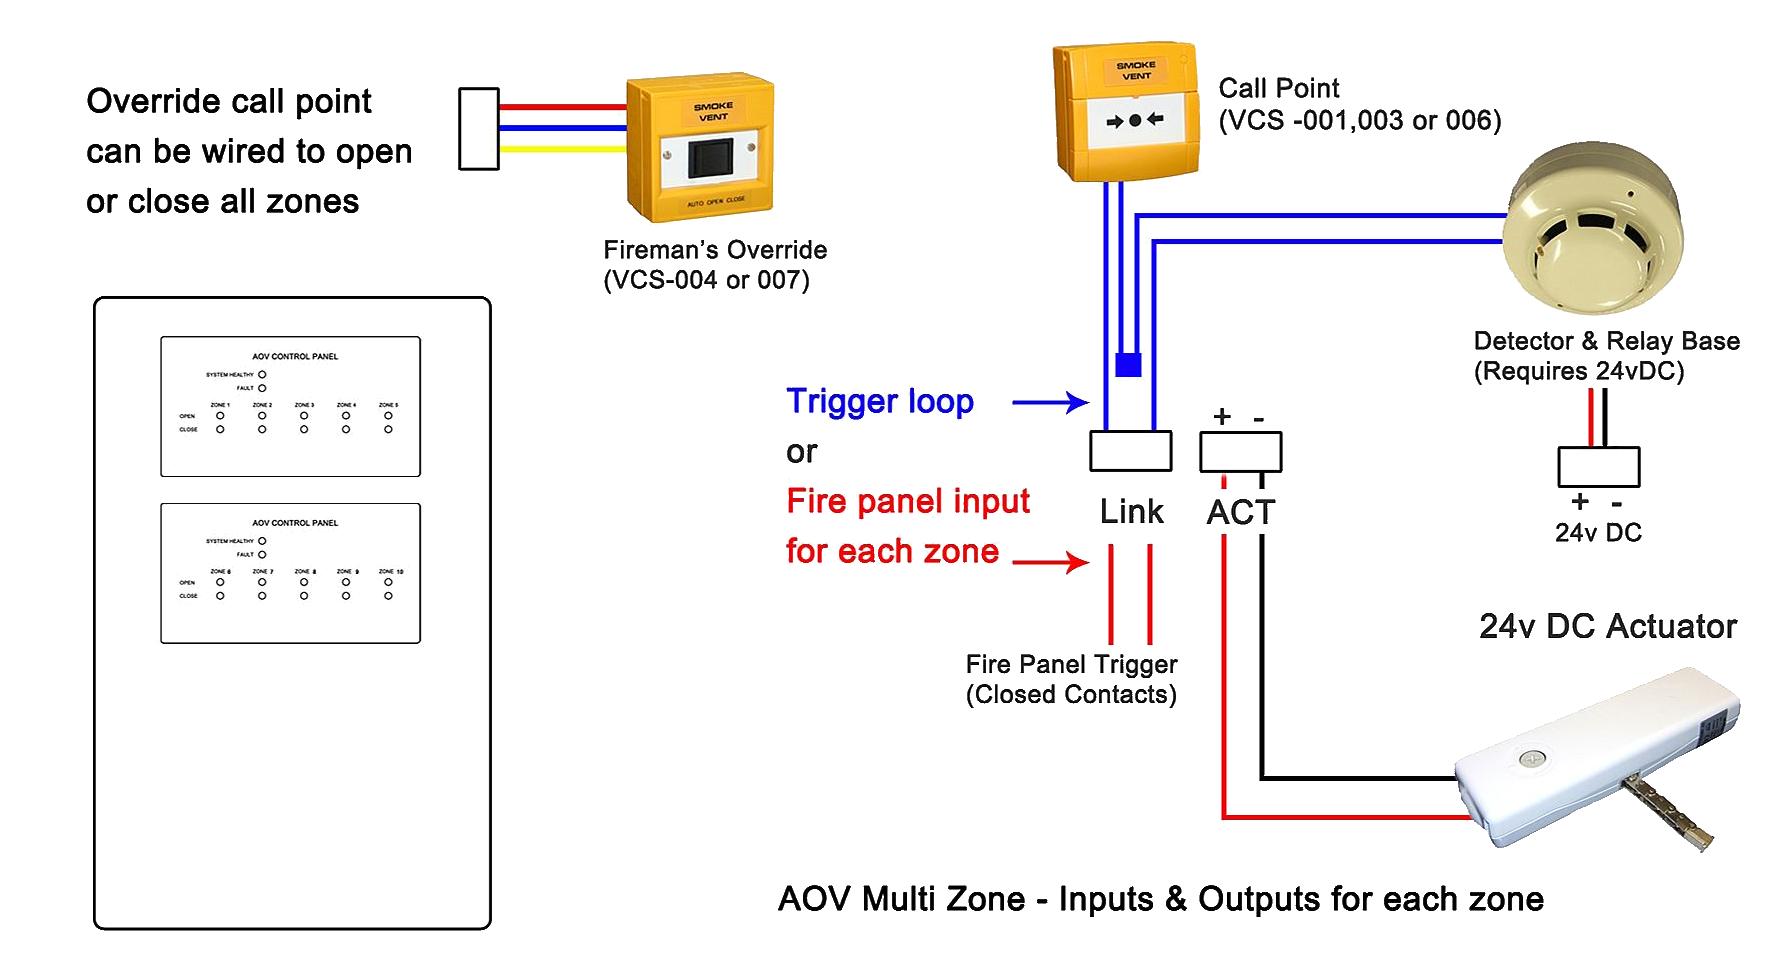 Multi-Zone-AOV-Layout-Wiring Manual Call Point Wiring Diagram on smoke detector block diagram, how work smoke detectors diagram, smoke detector circuit diagram,